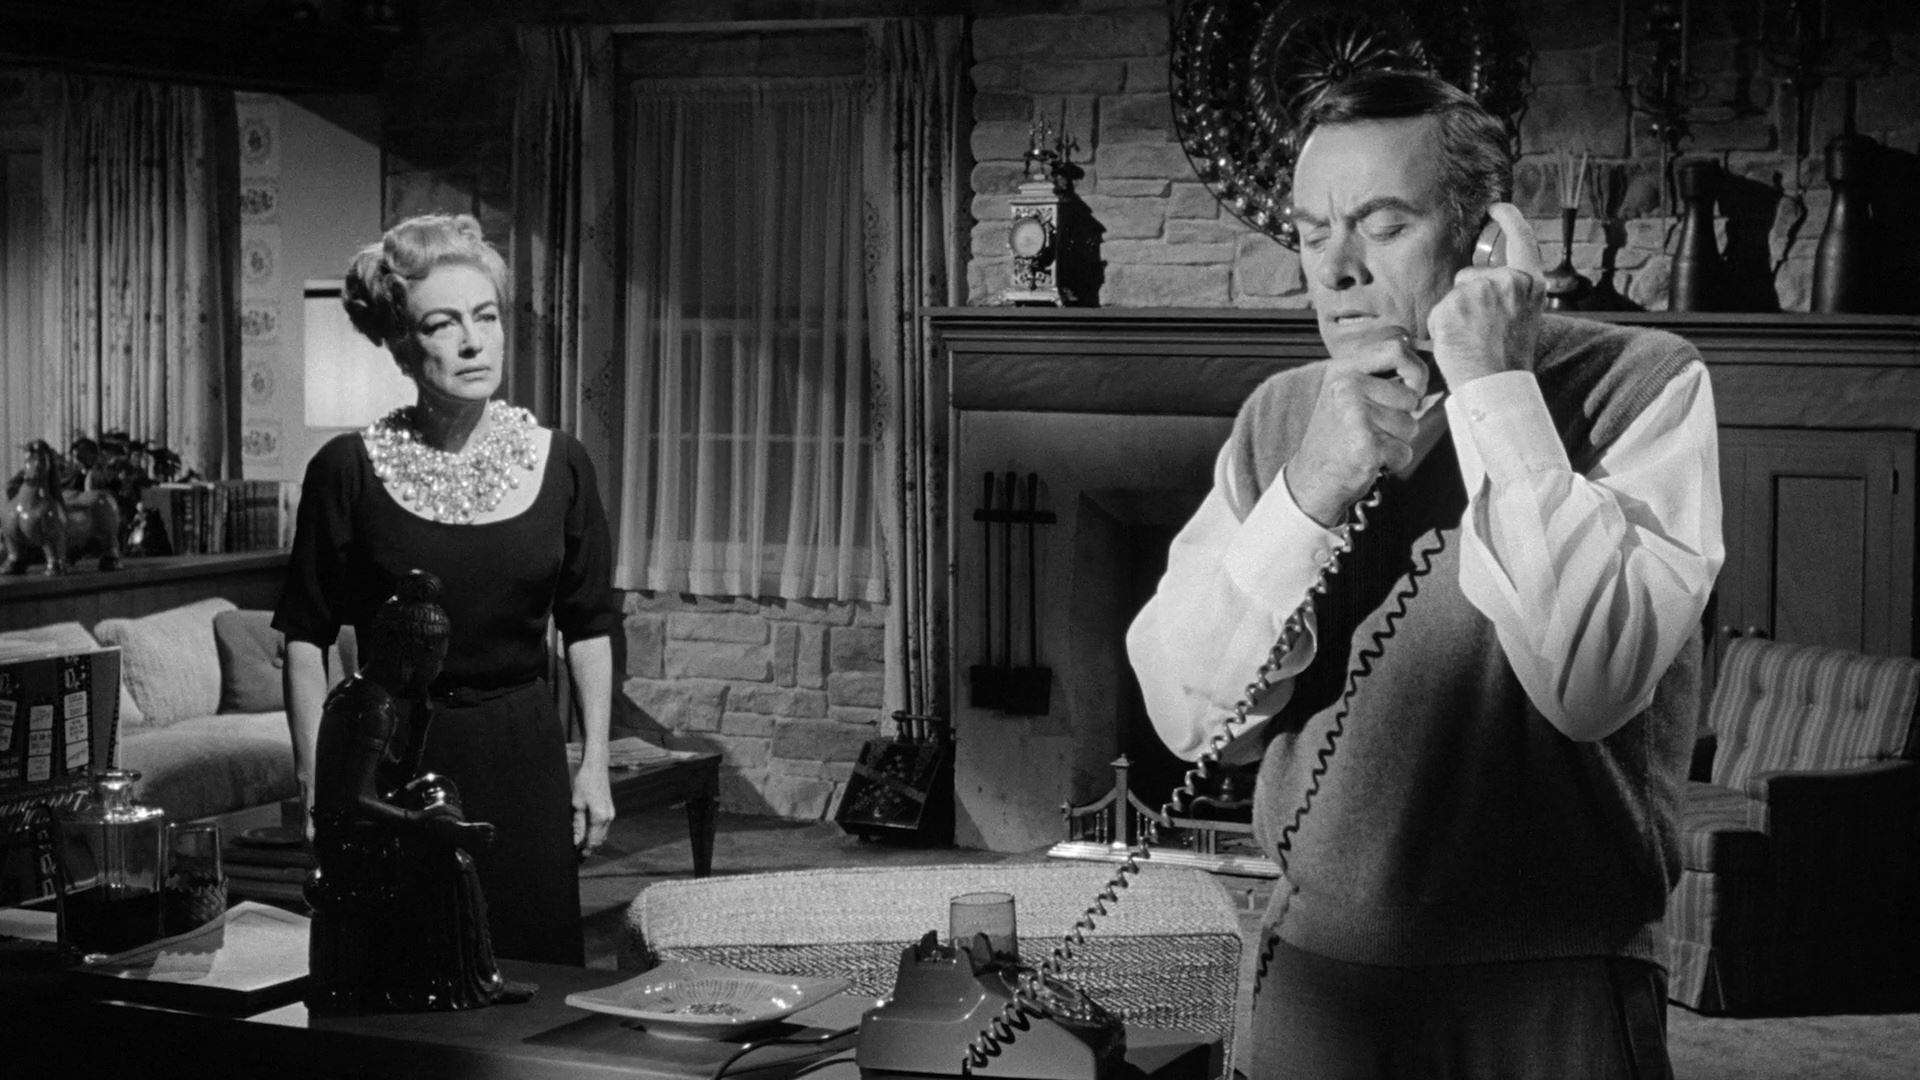 I Saw What You Did (1965) 1. kép